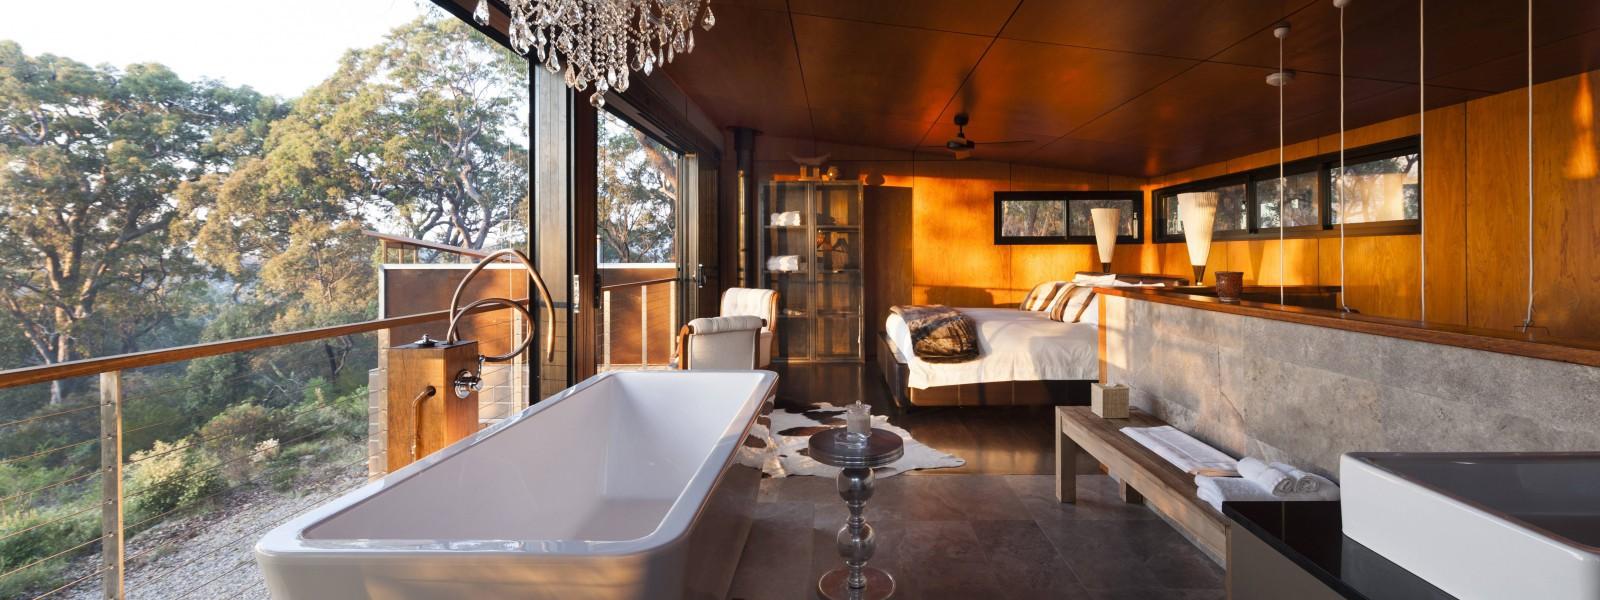 Australia Resort Vacation Rentals Suites Blue Mountain